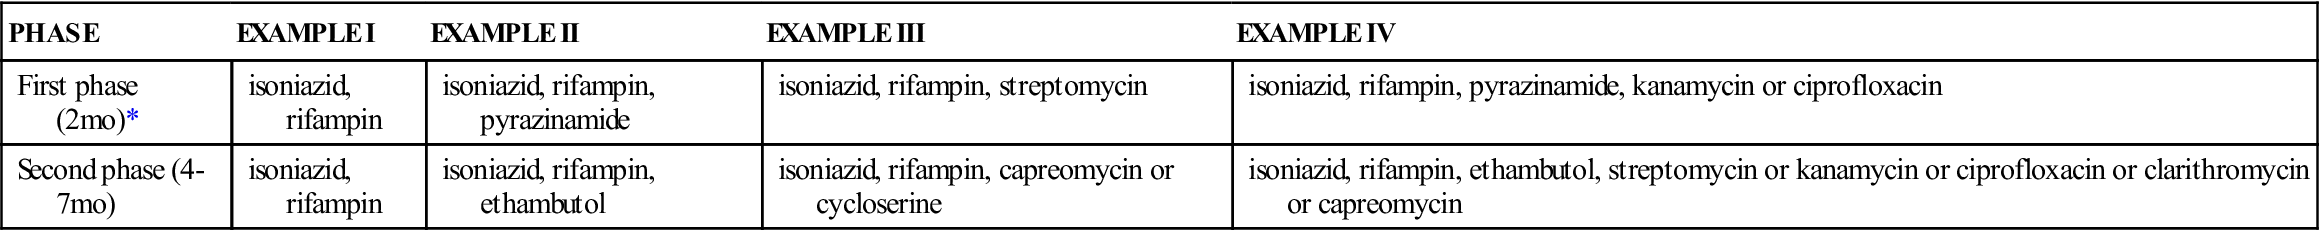 slimex 15 mg rendelés